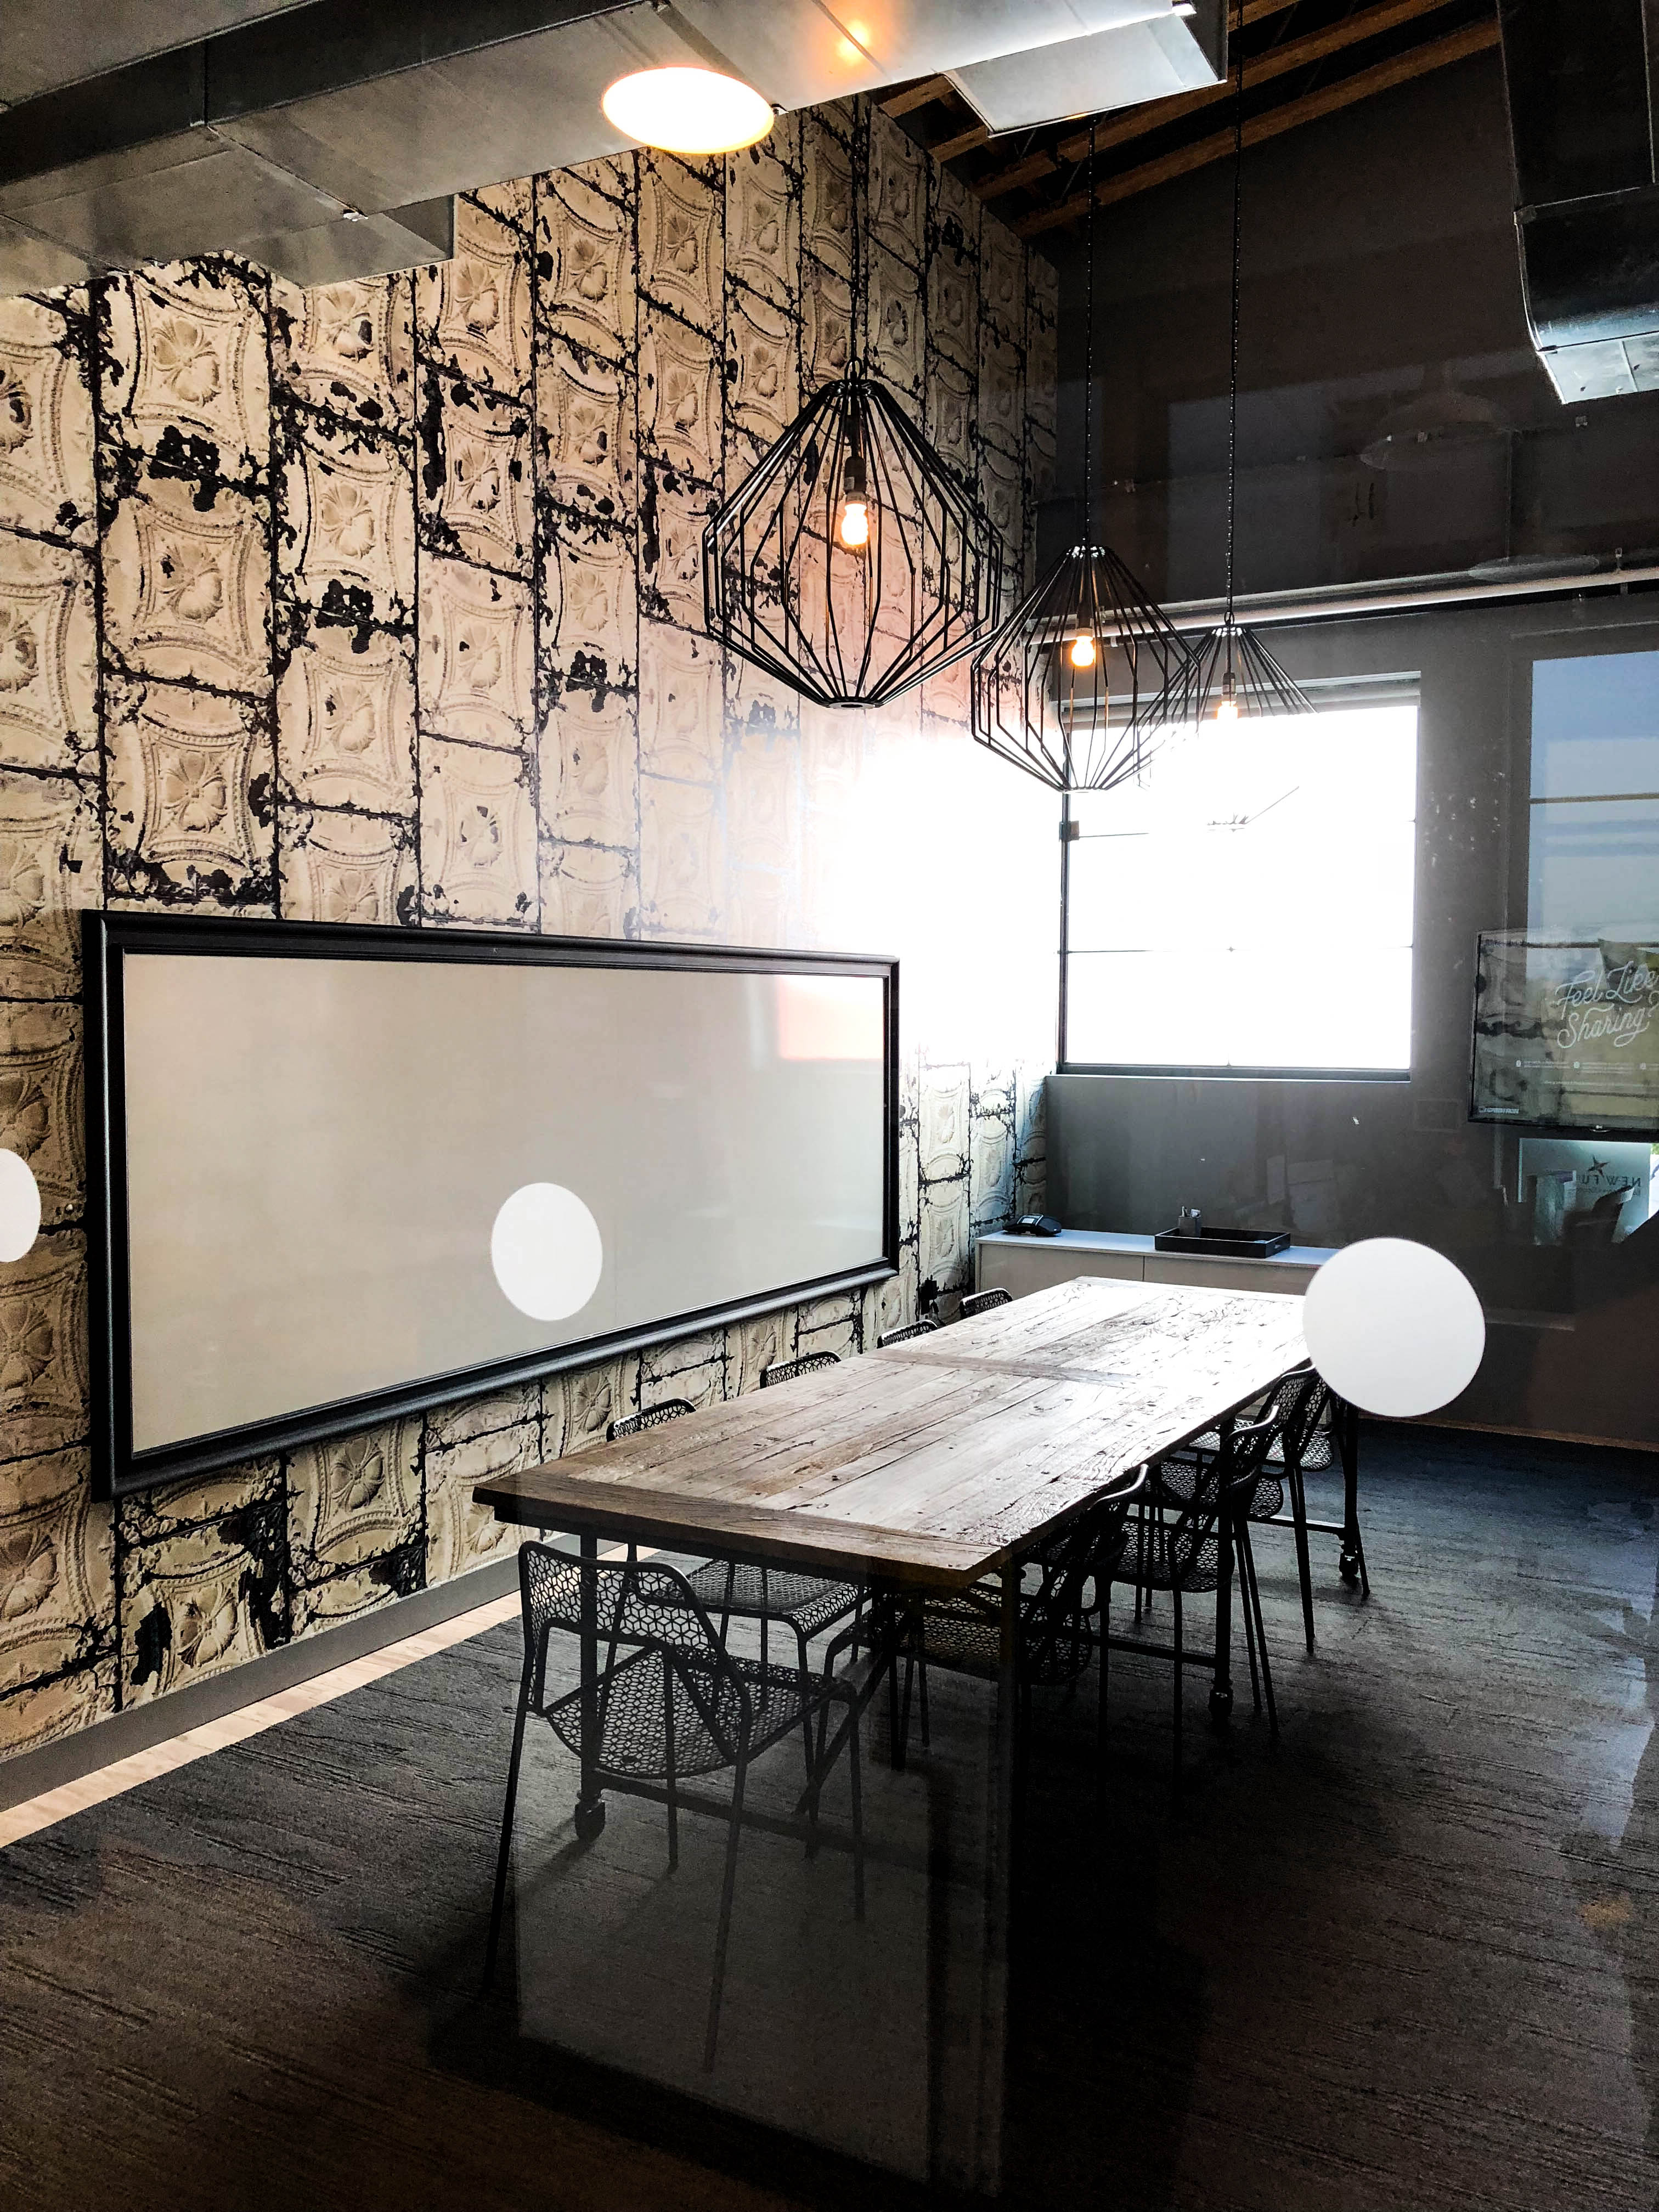 WeWorks - Wonderbread - conference room table